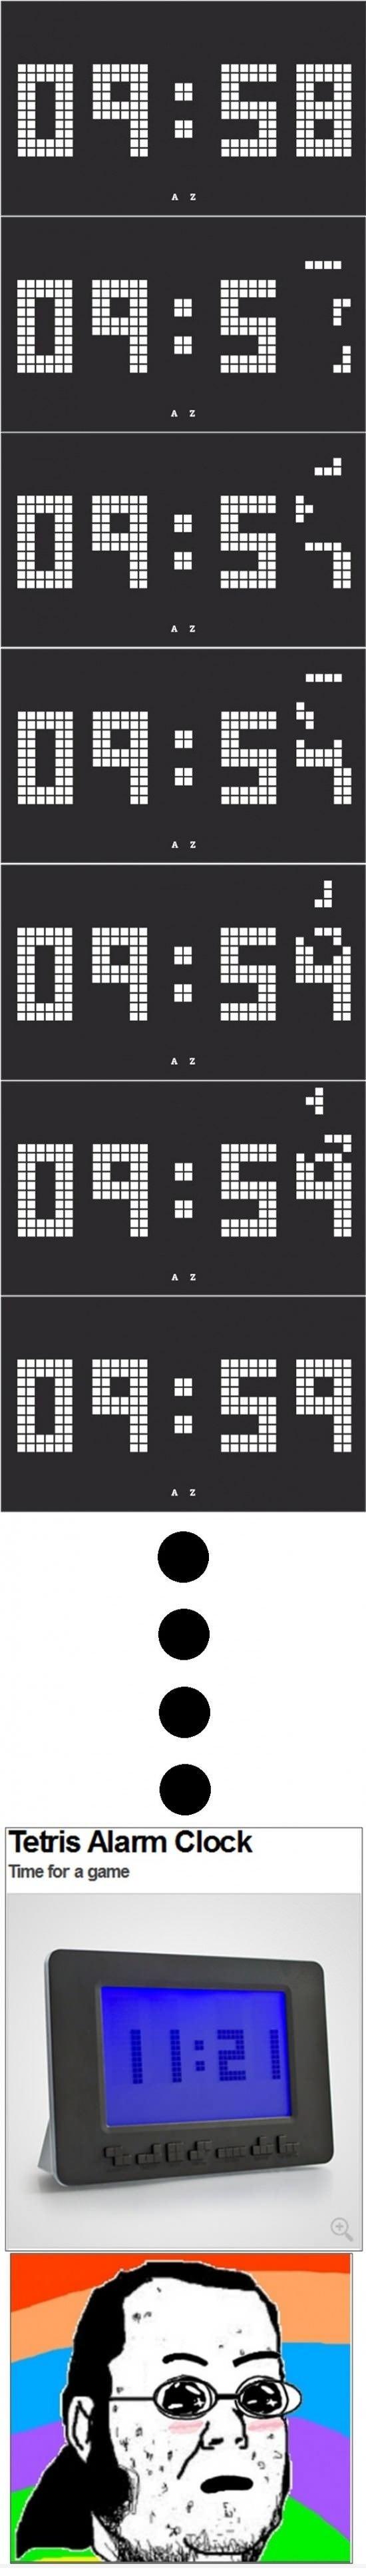 Just an ordinary clock?